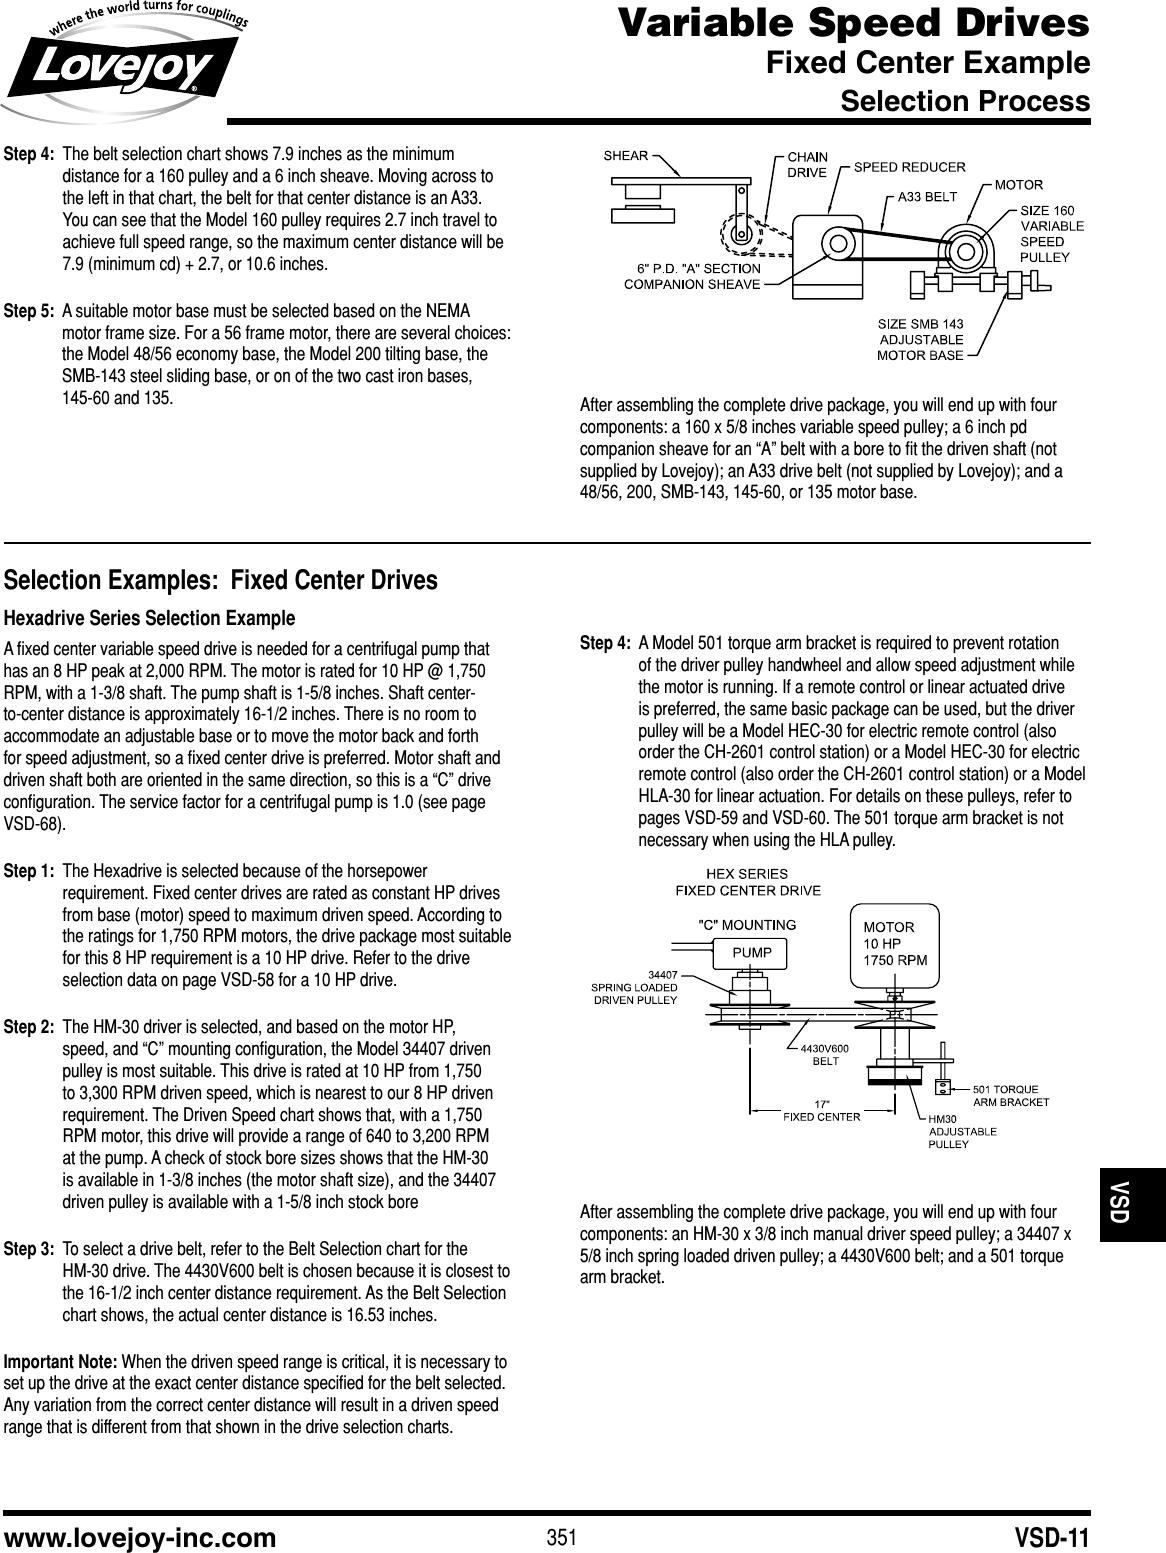 Variable Speed Drives Catalog